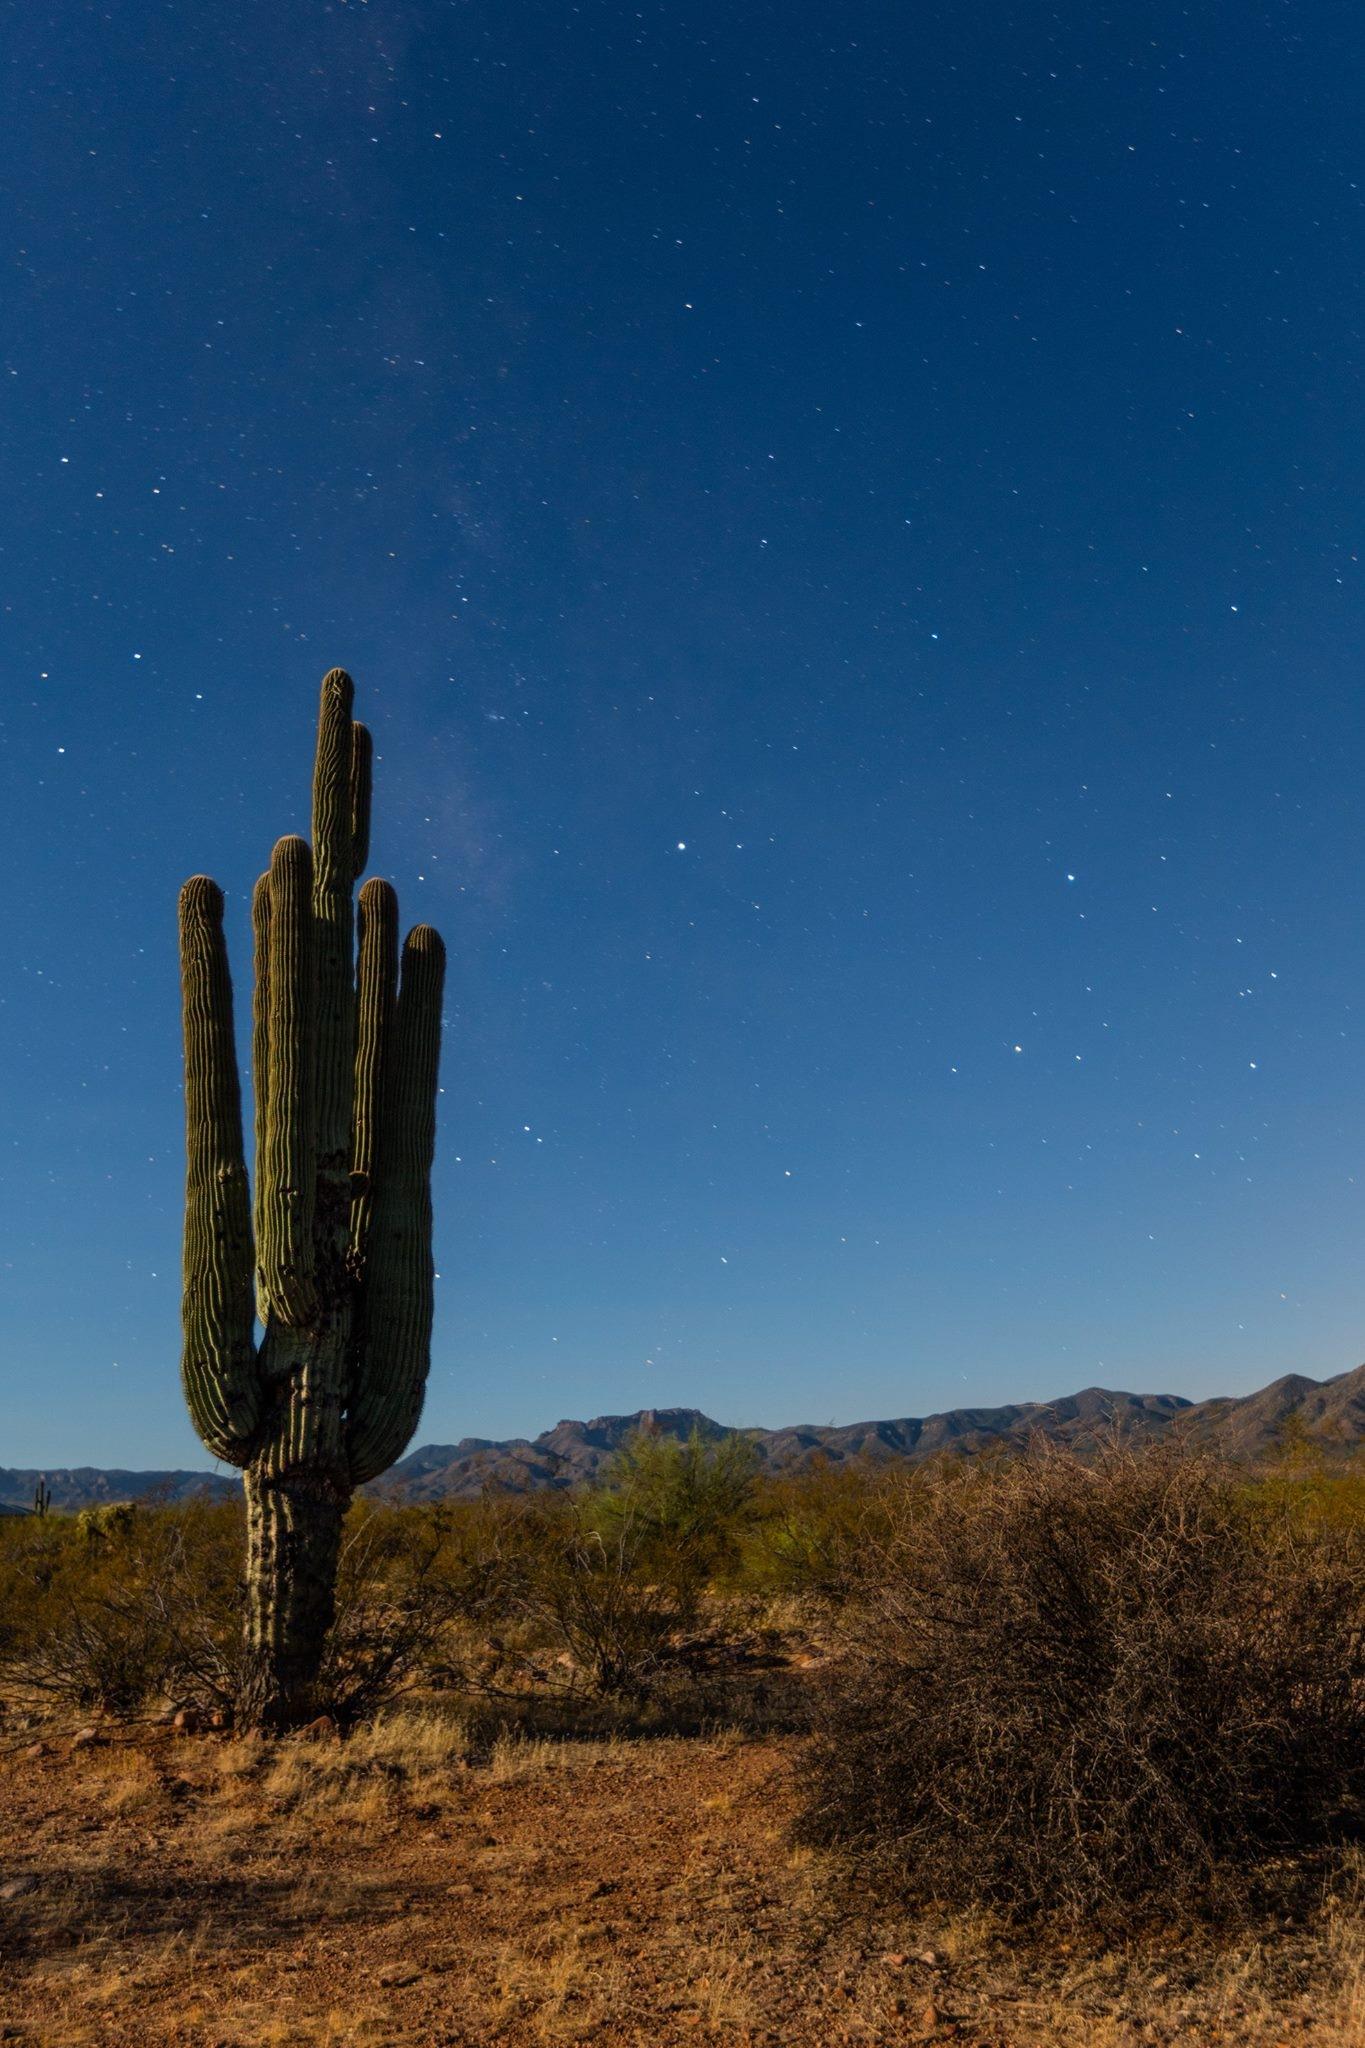 Night Cactus by RonaldSill